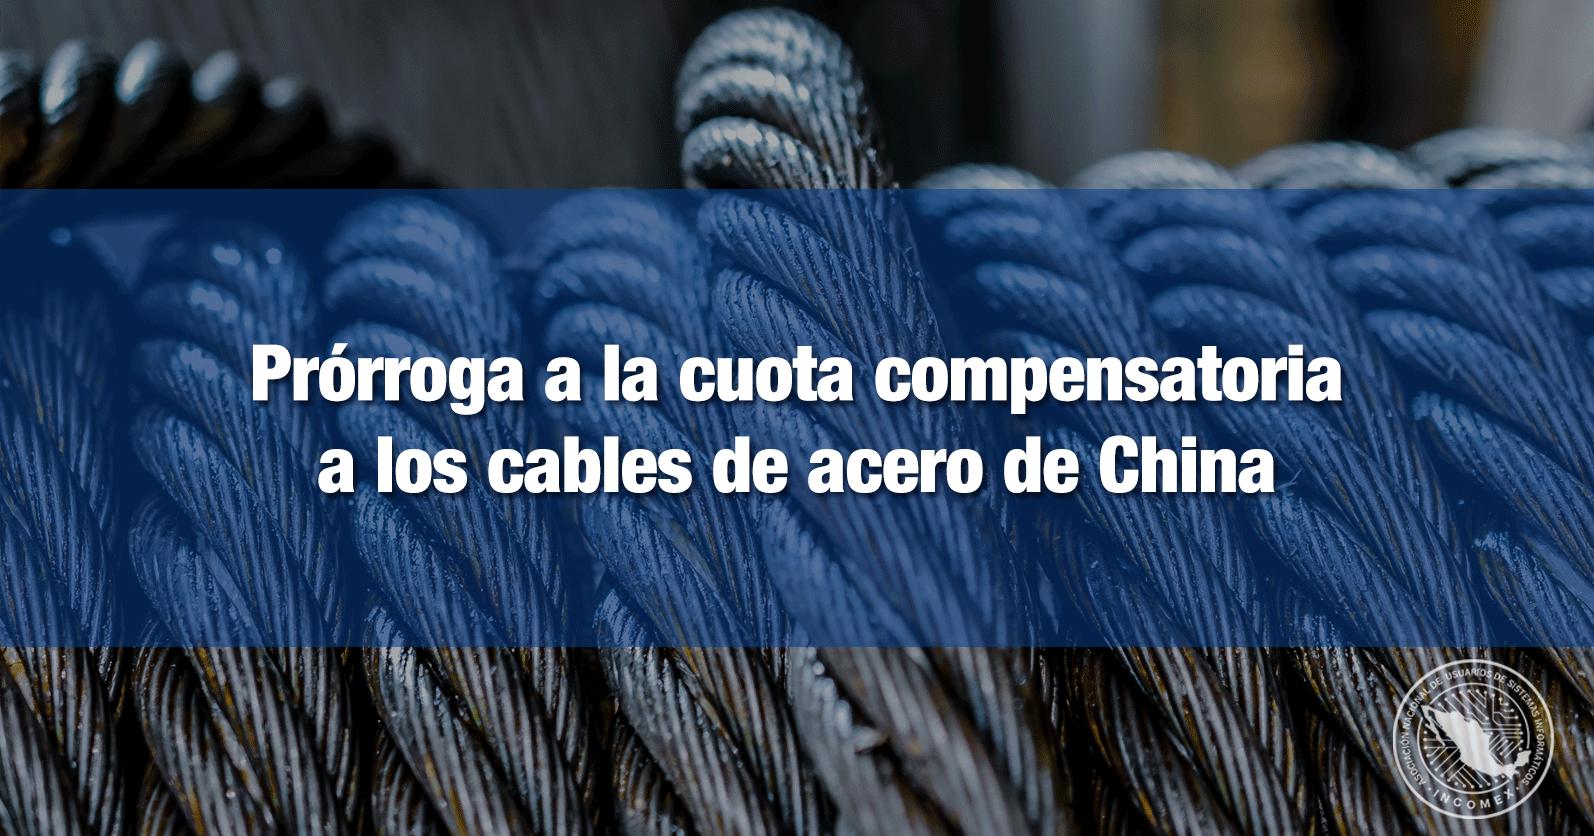 Prórroga a la cuota compensatoria a los cables de acero de China